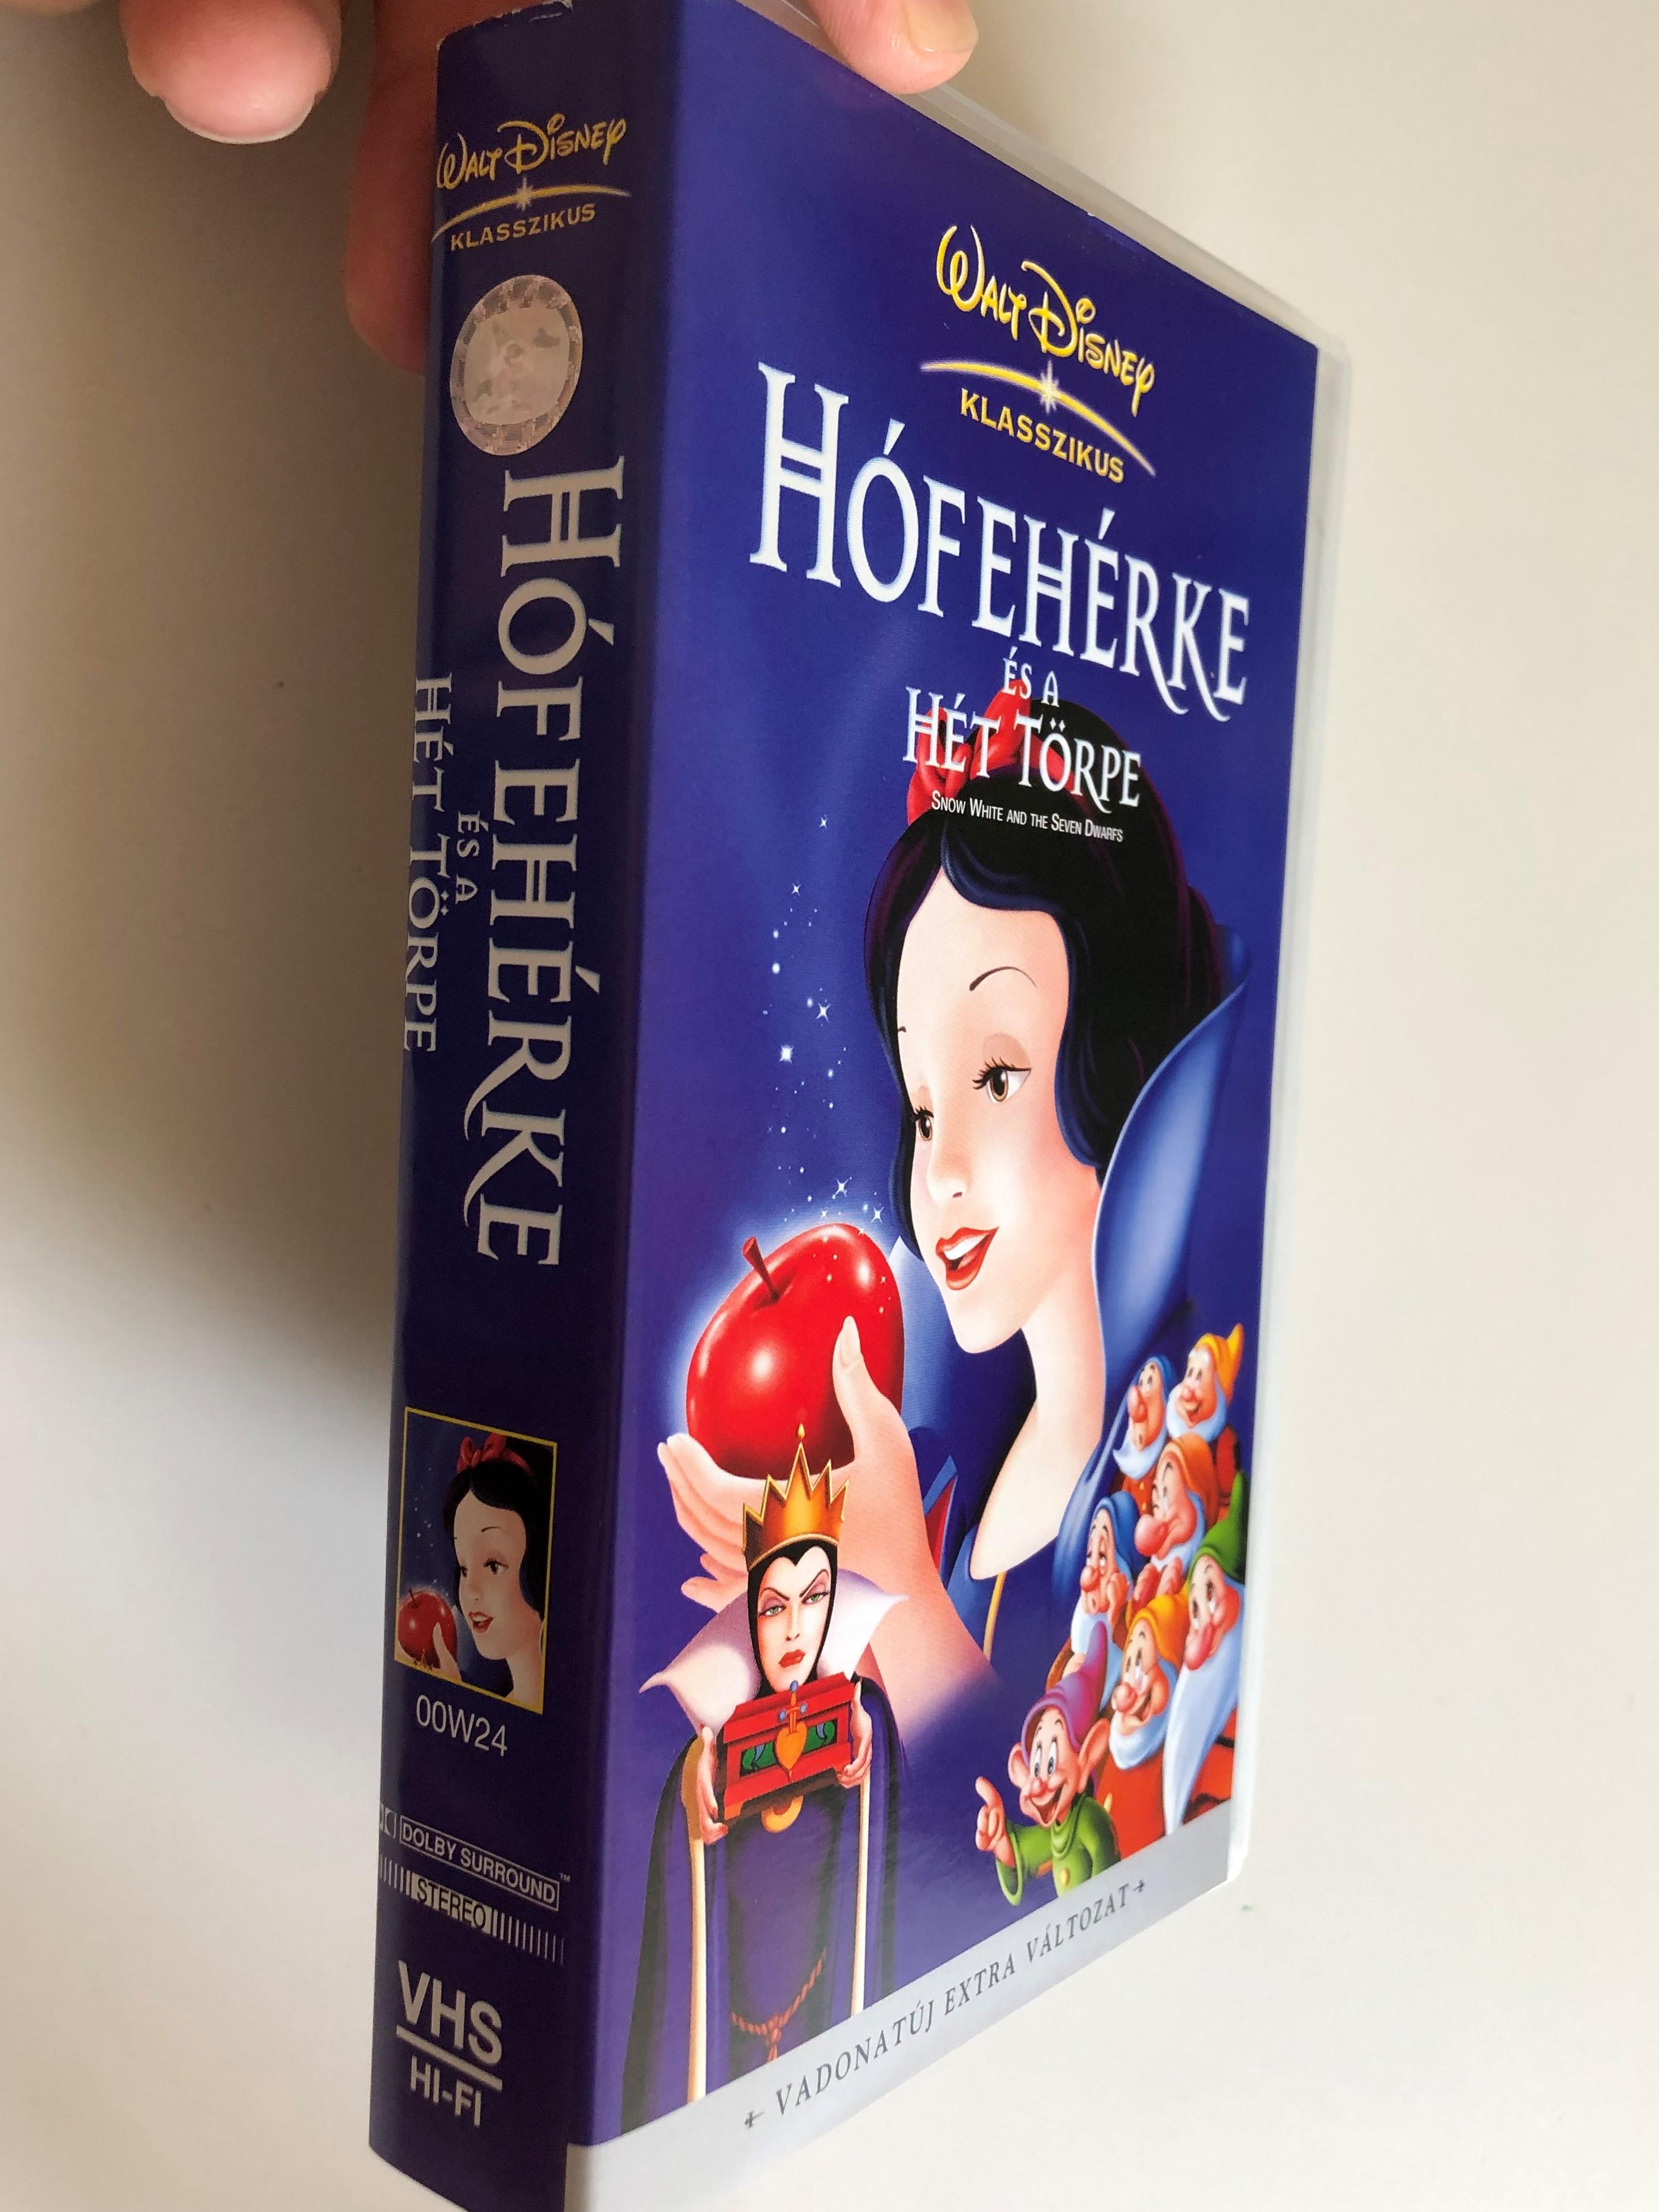 h-feh-rke-s-a-h-t-t-rpe-vhs-1994-snow-white-and-the-seven-dwarfs-hungarian-director-david-hand-walt-disney-classics-2-.jpg